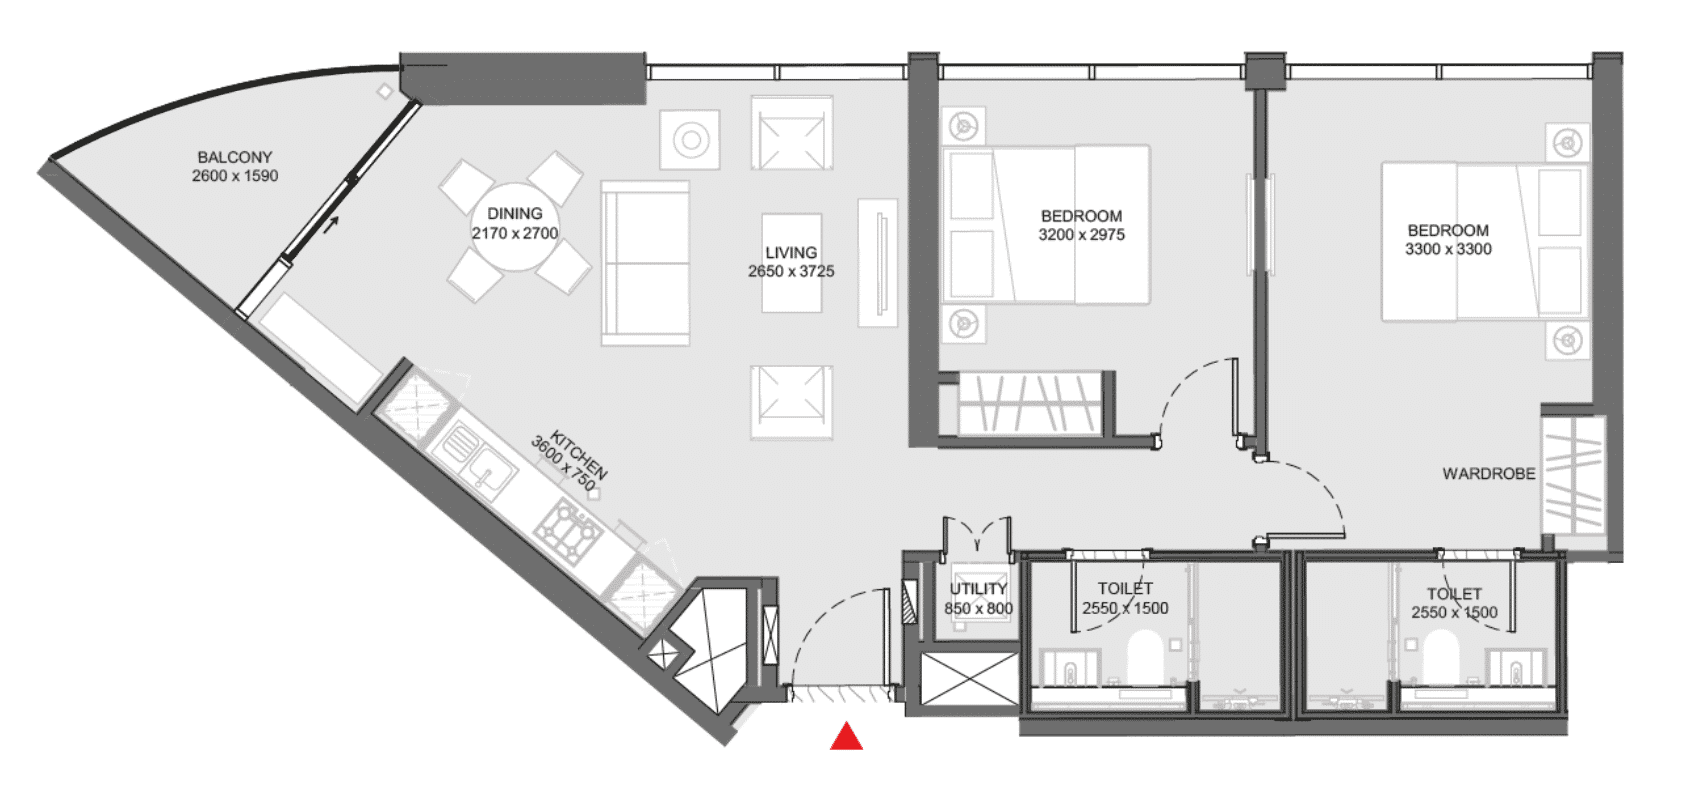 Appartement à 2 chambres (Type A2)